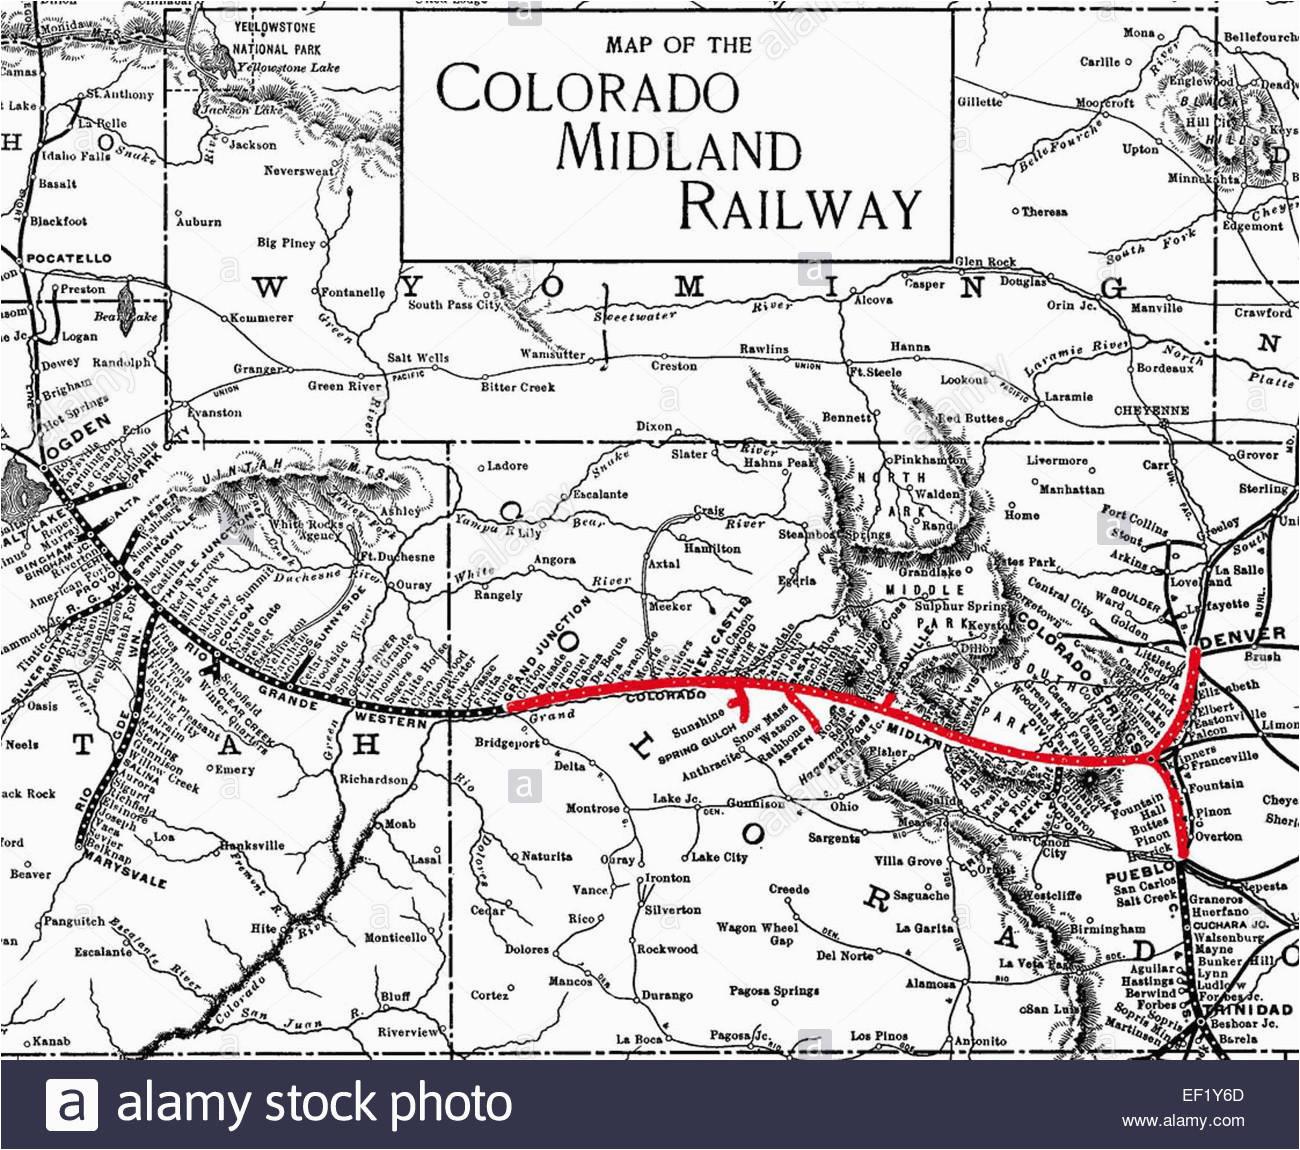 historic railway map stock photos historic railway map stock